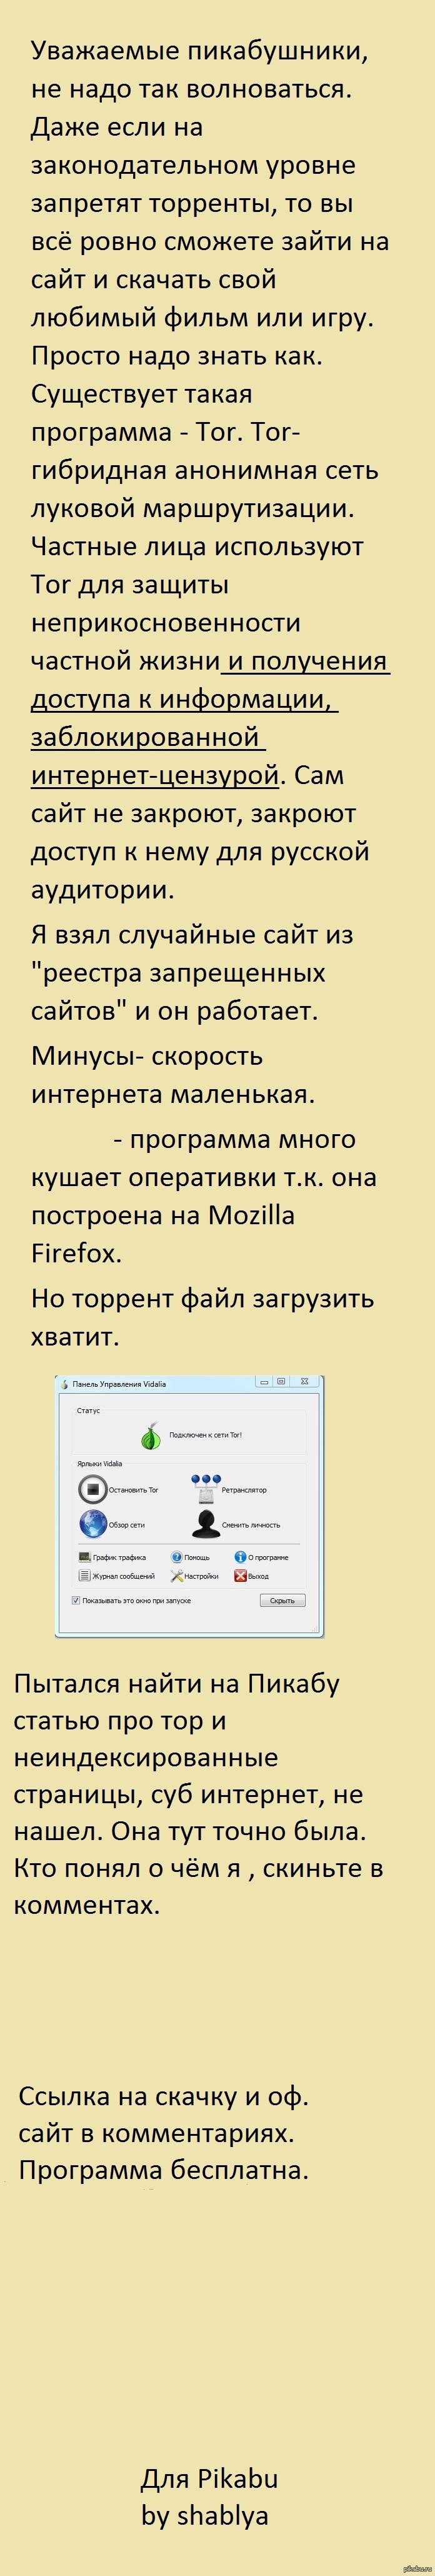 golaya-devushka-na-rolikah